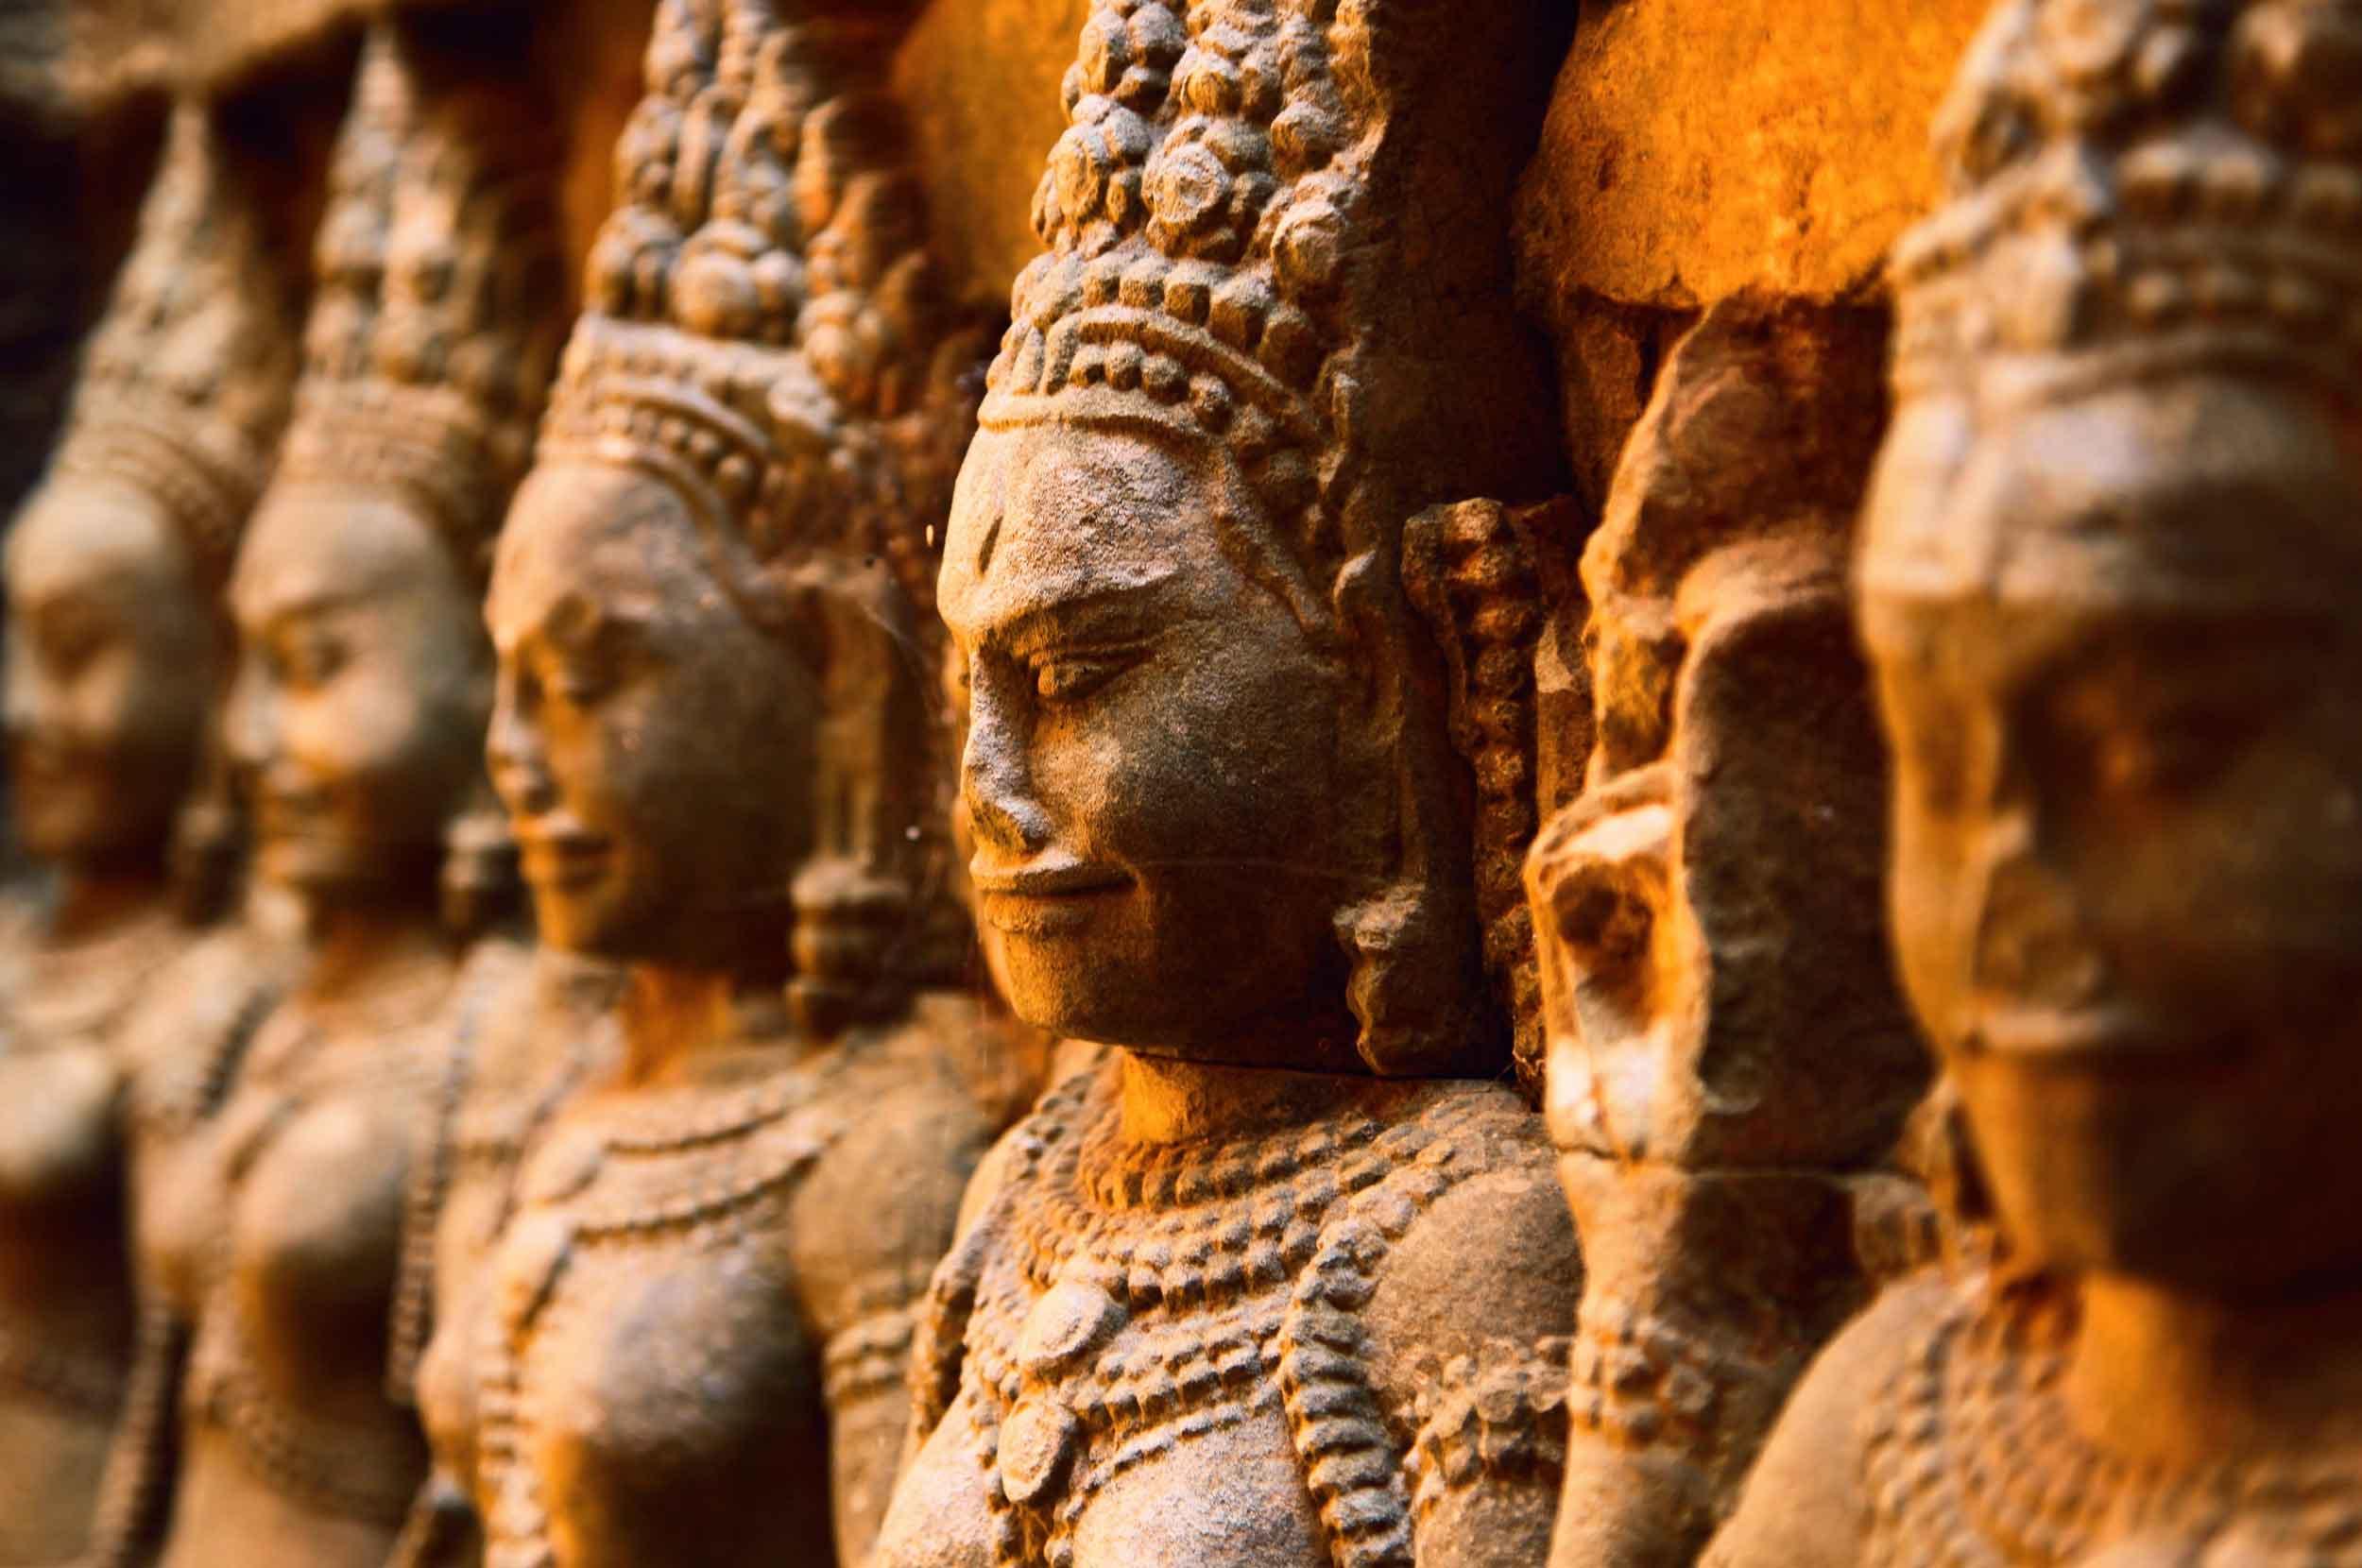 The many faces of Ancient Angkor